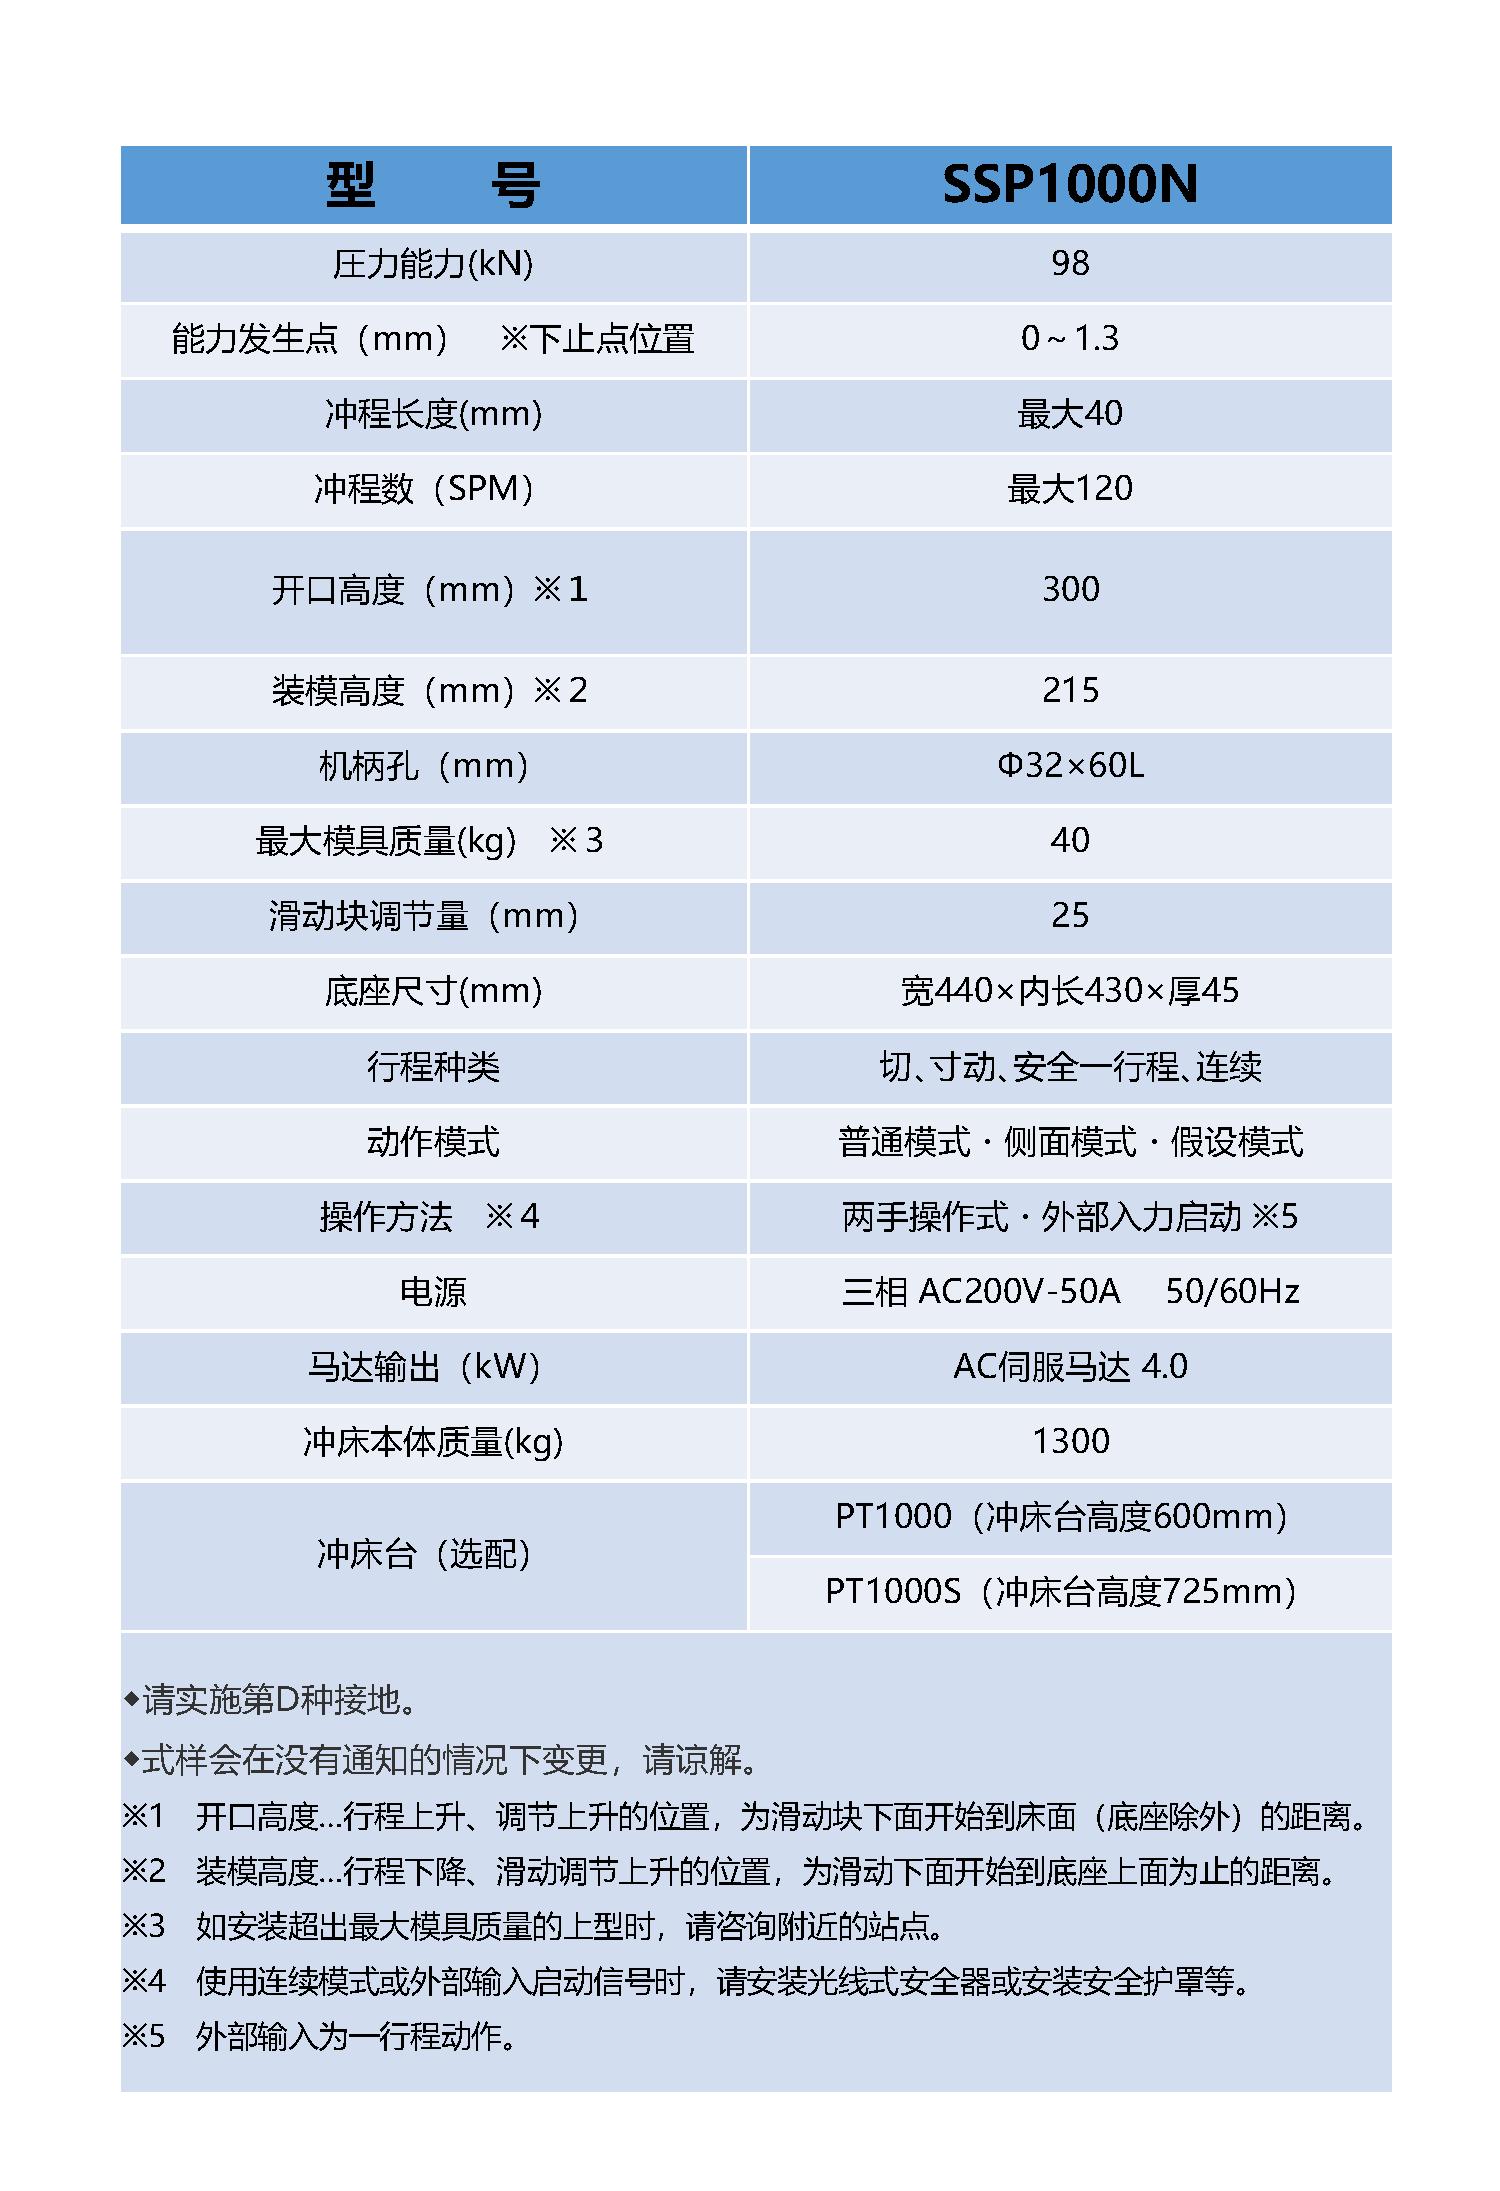 SSP1000N_仕様表_D - 中文.png